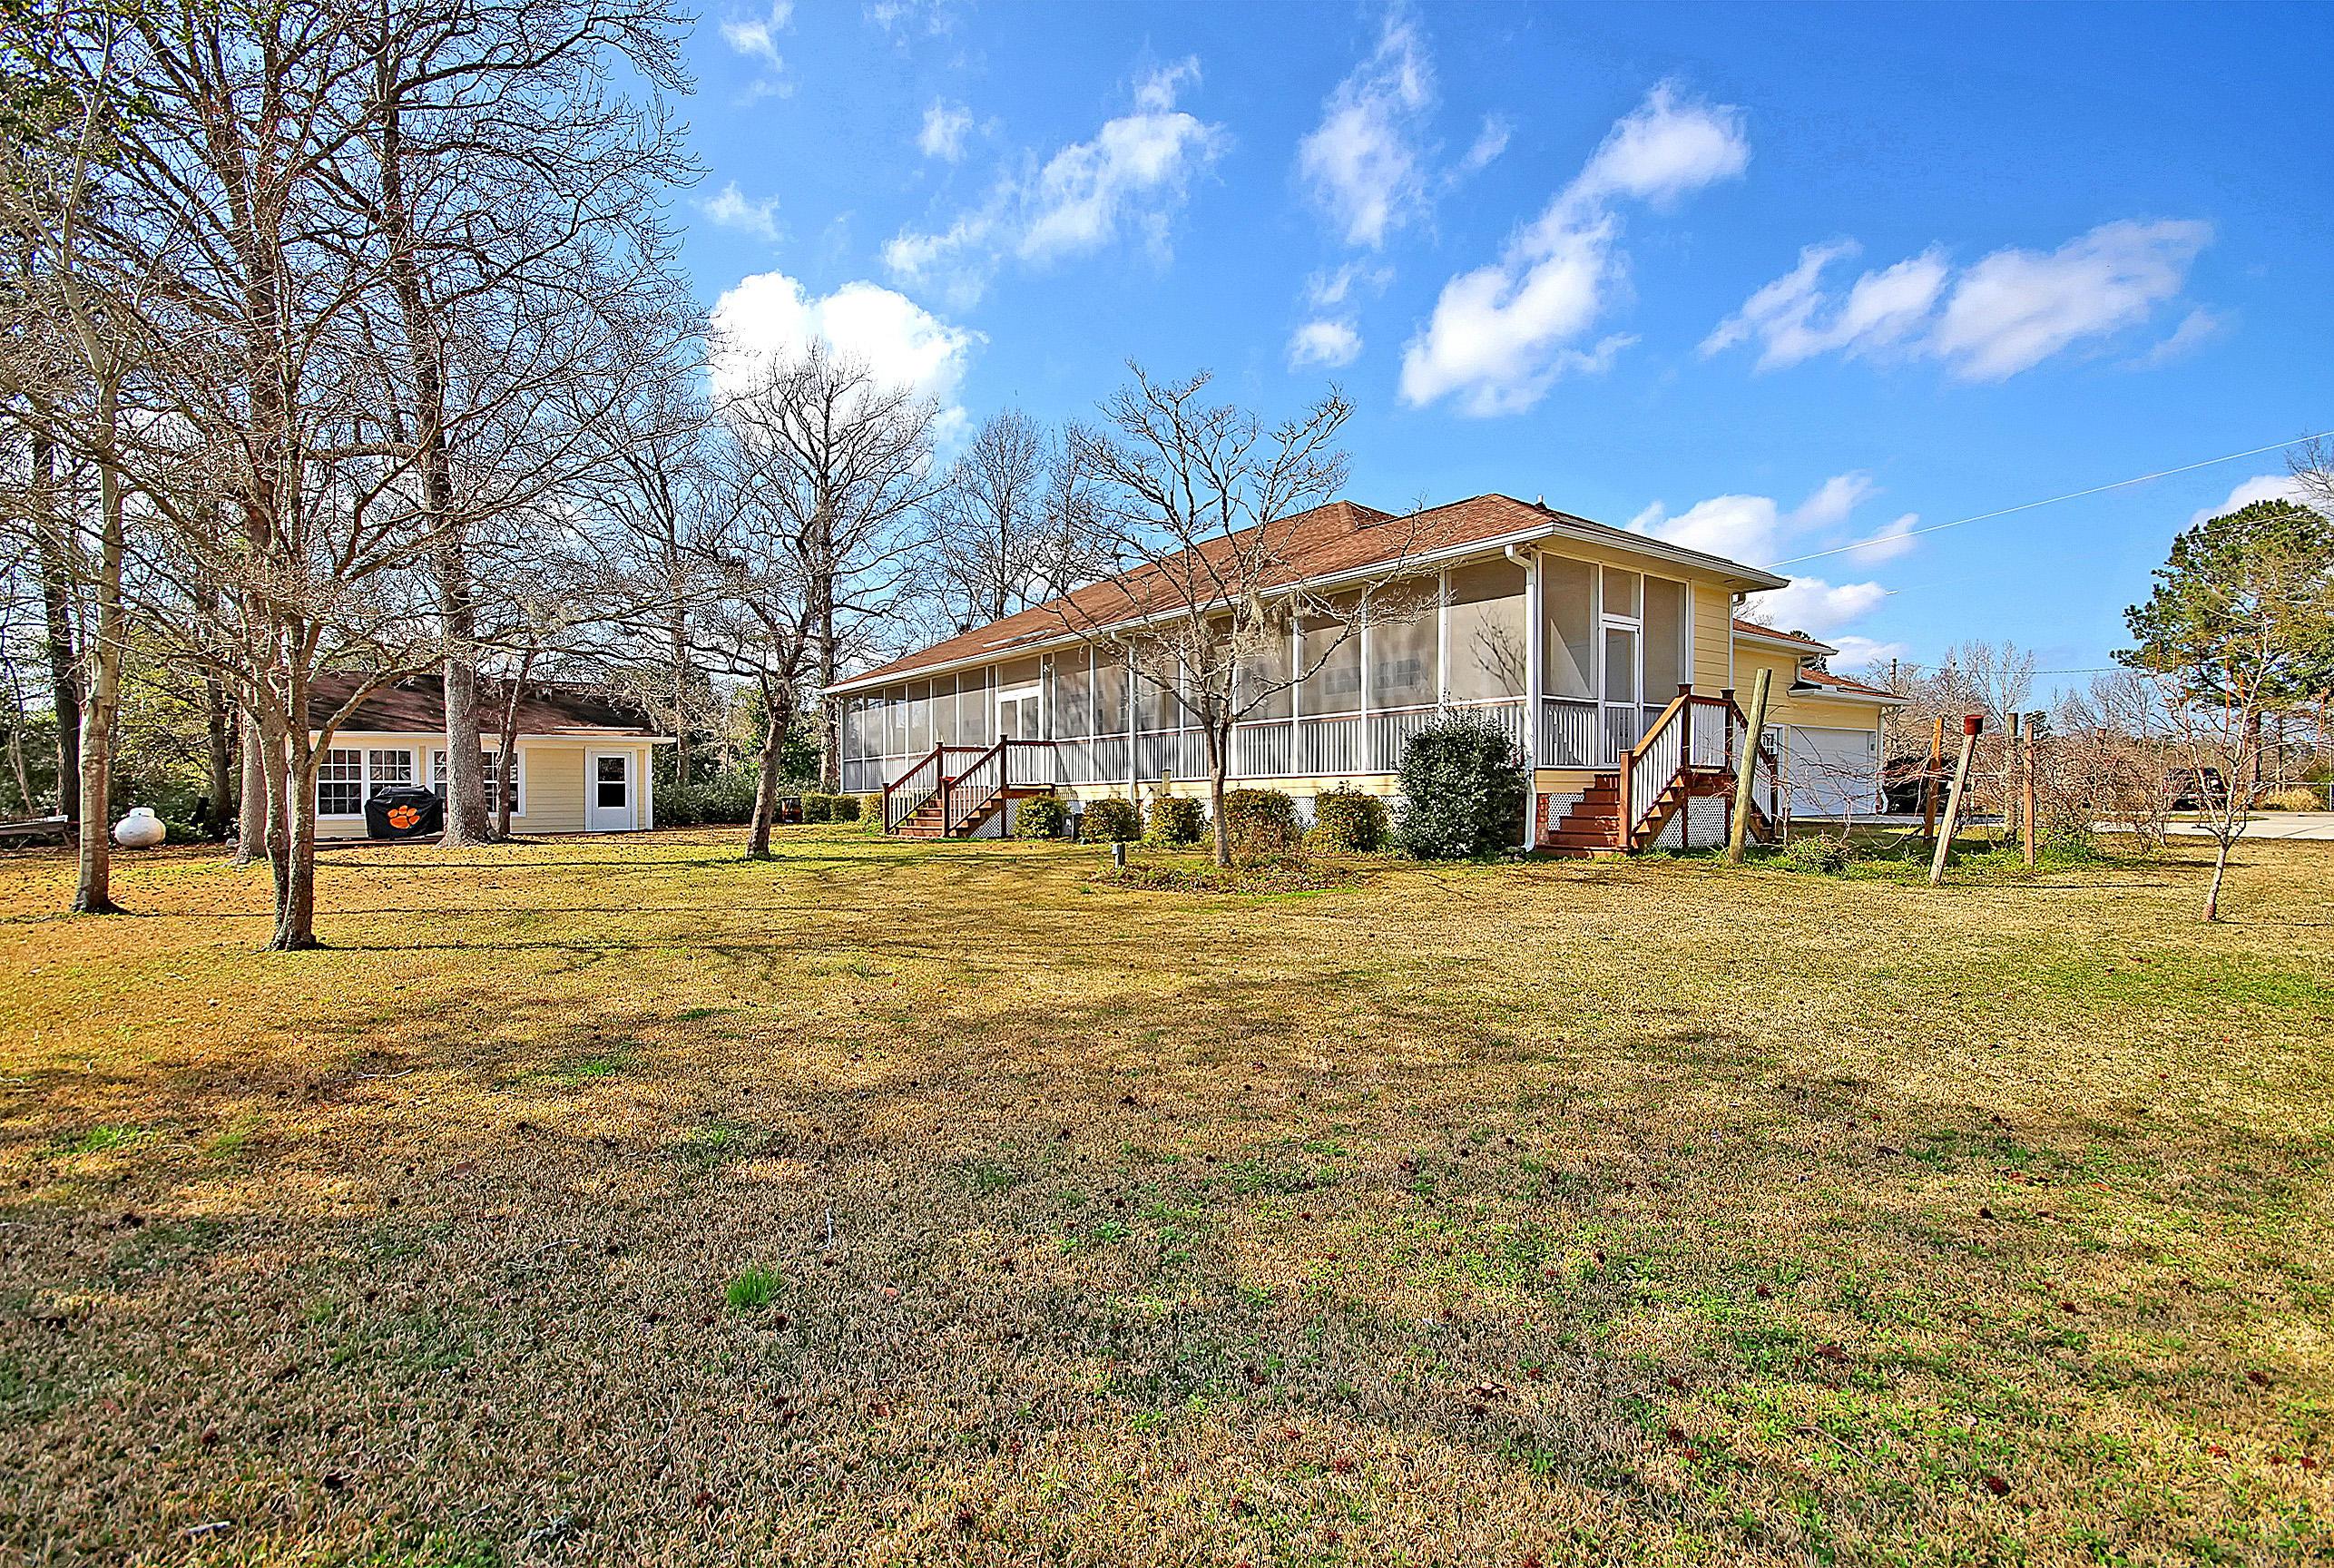 Cross Subd (Longpoint) Homes For Sale - 1191 Longpoint, Cross, SC - 41